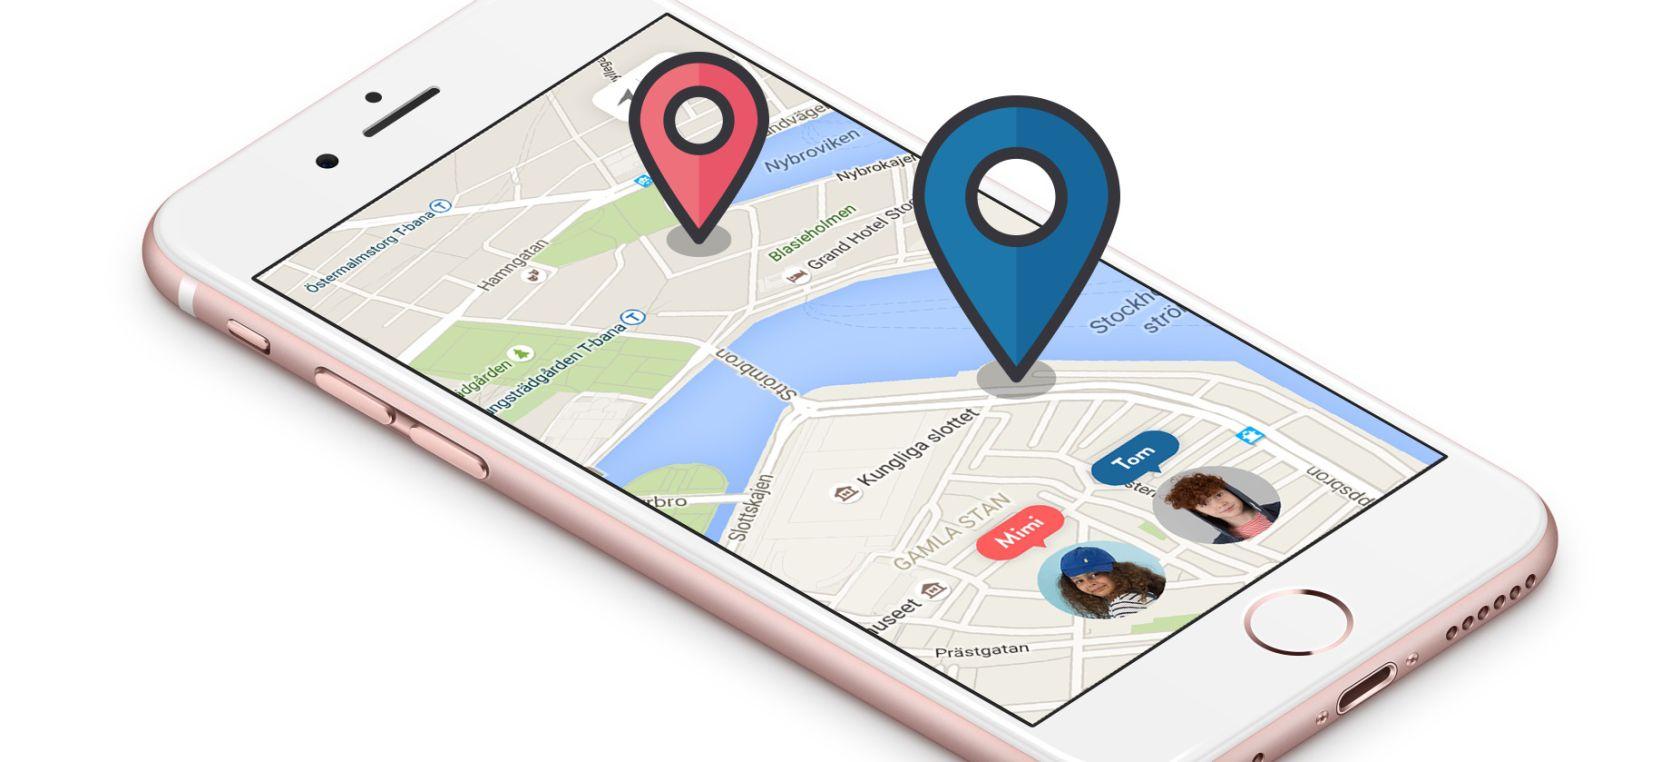 ubicacion del celular